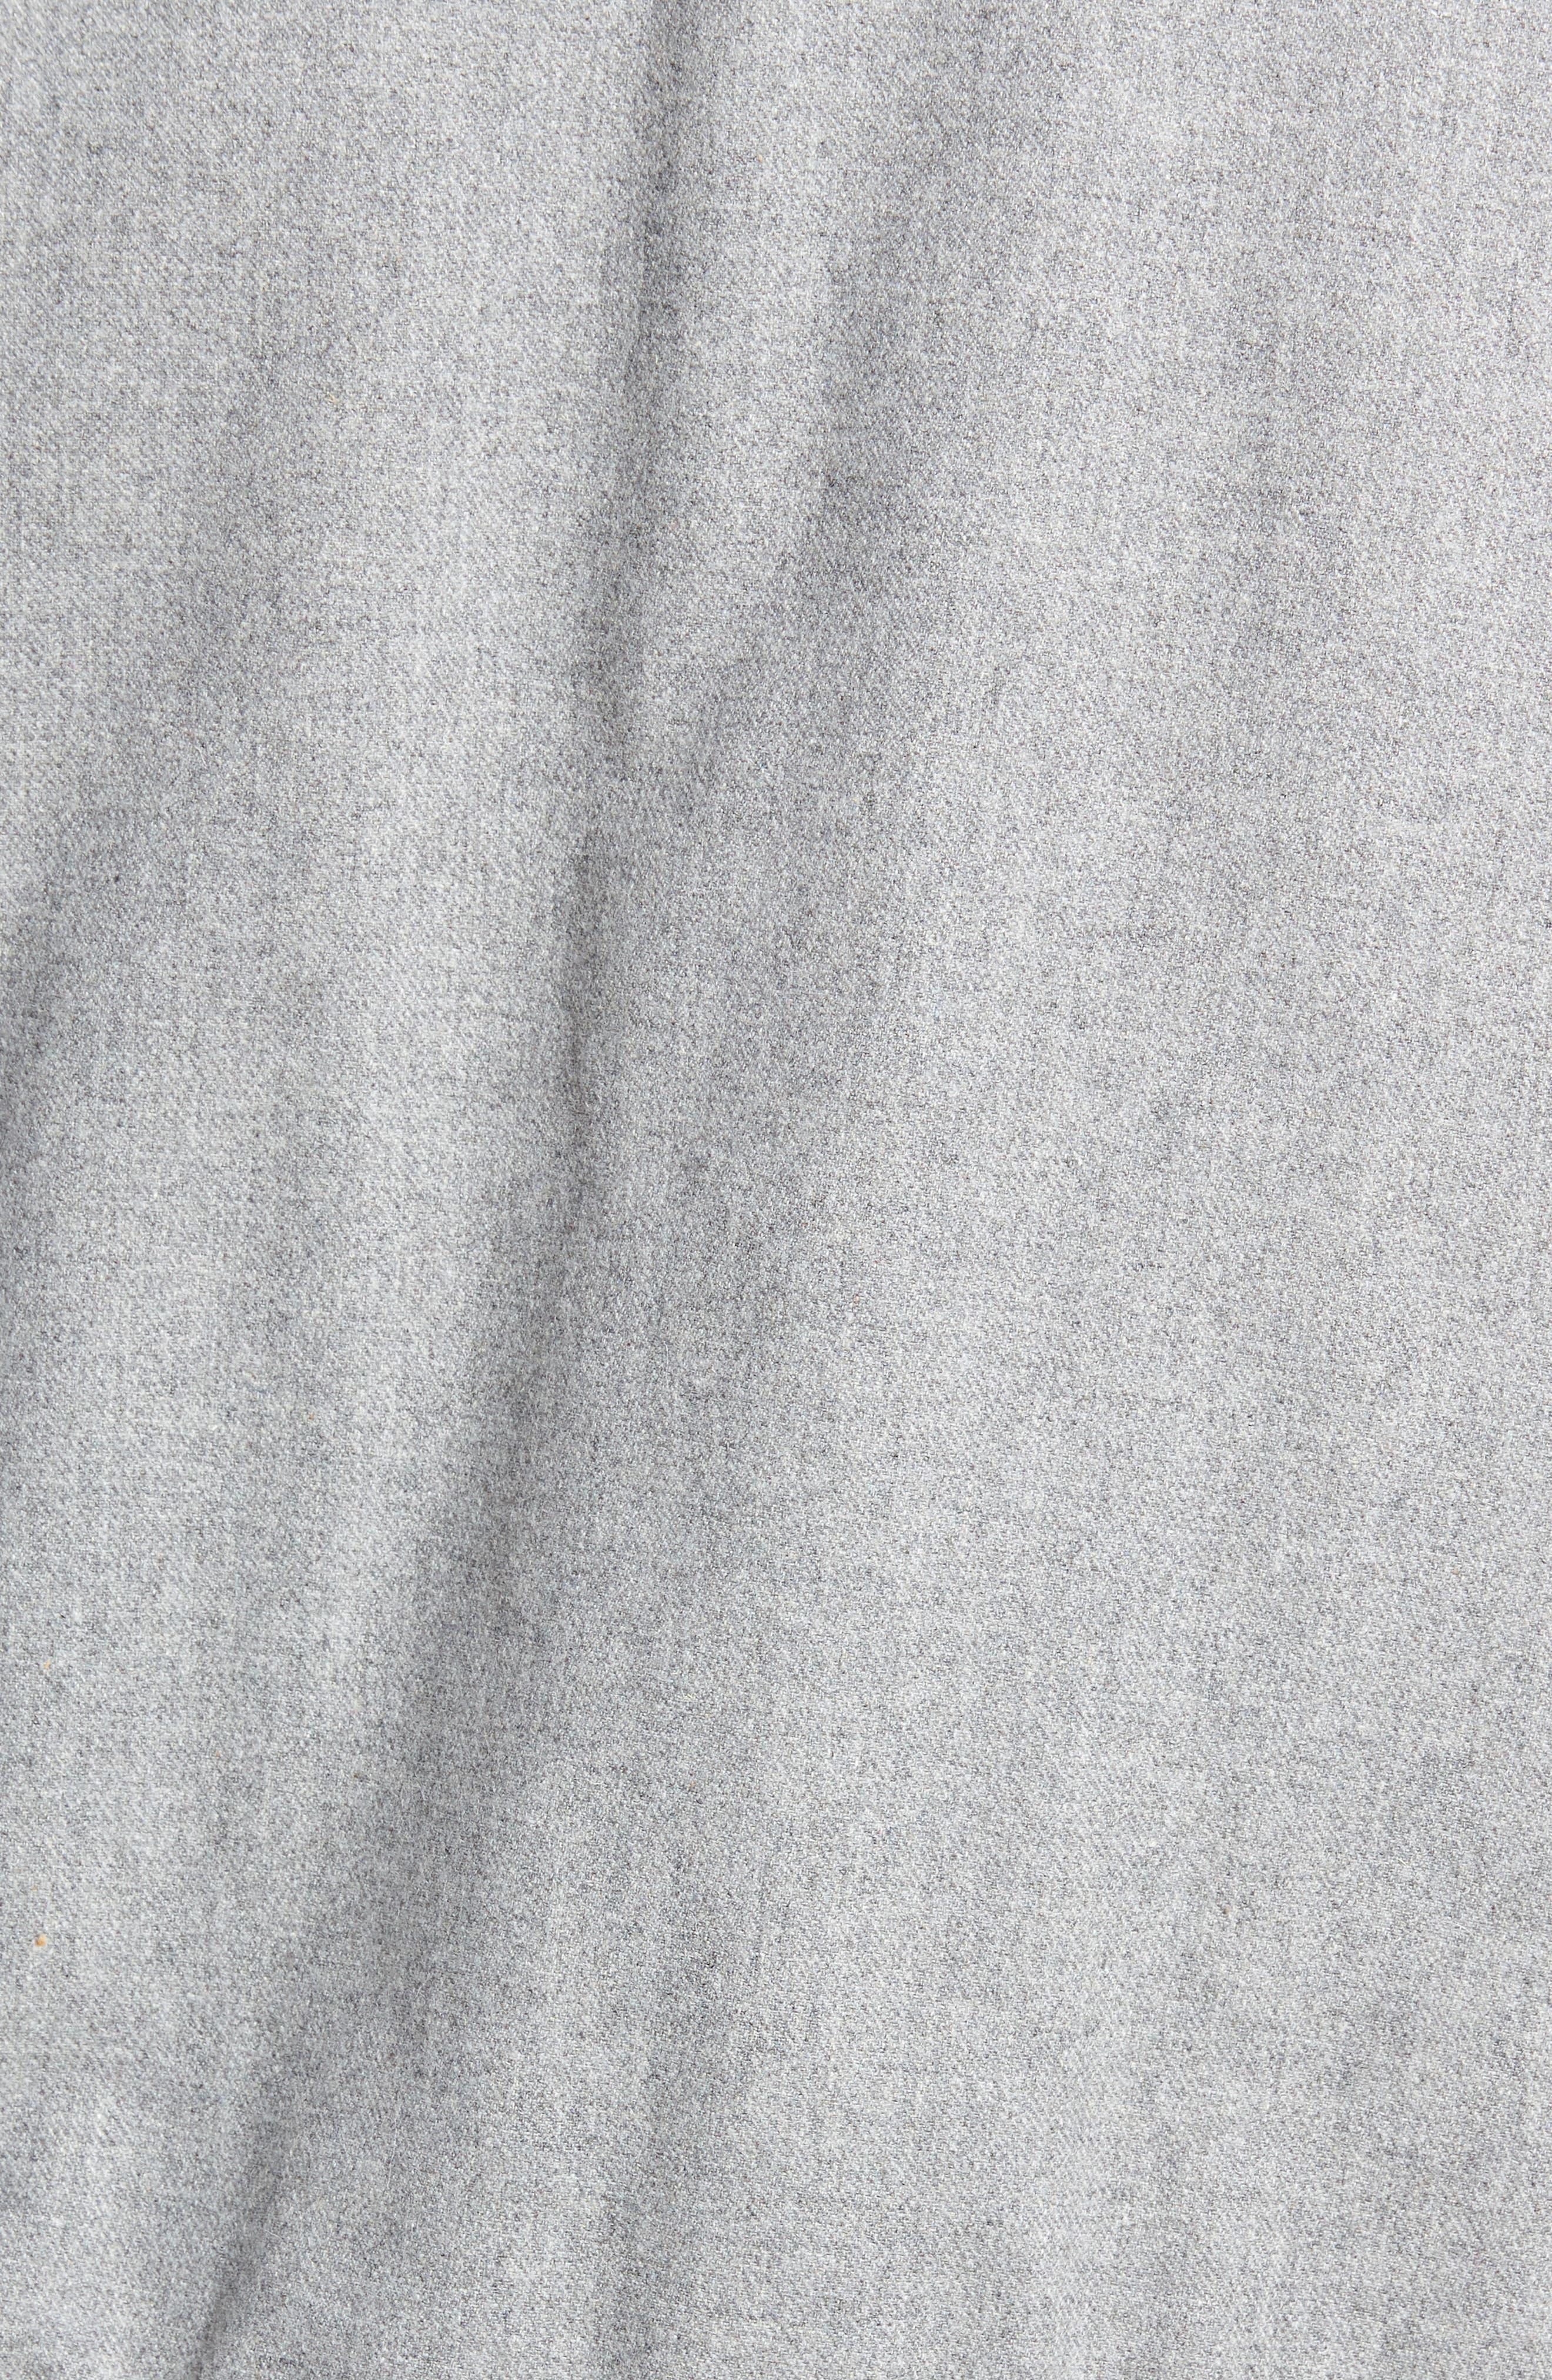 Button Front Bomber Jacket,                             Alternate thumbnail 7, color,                             GREY TORNADO HEATHER